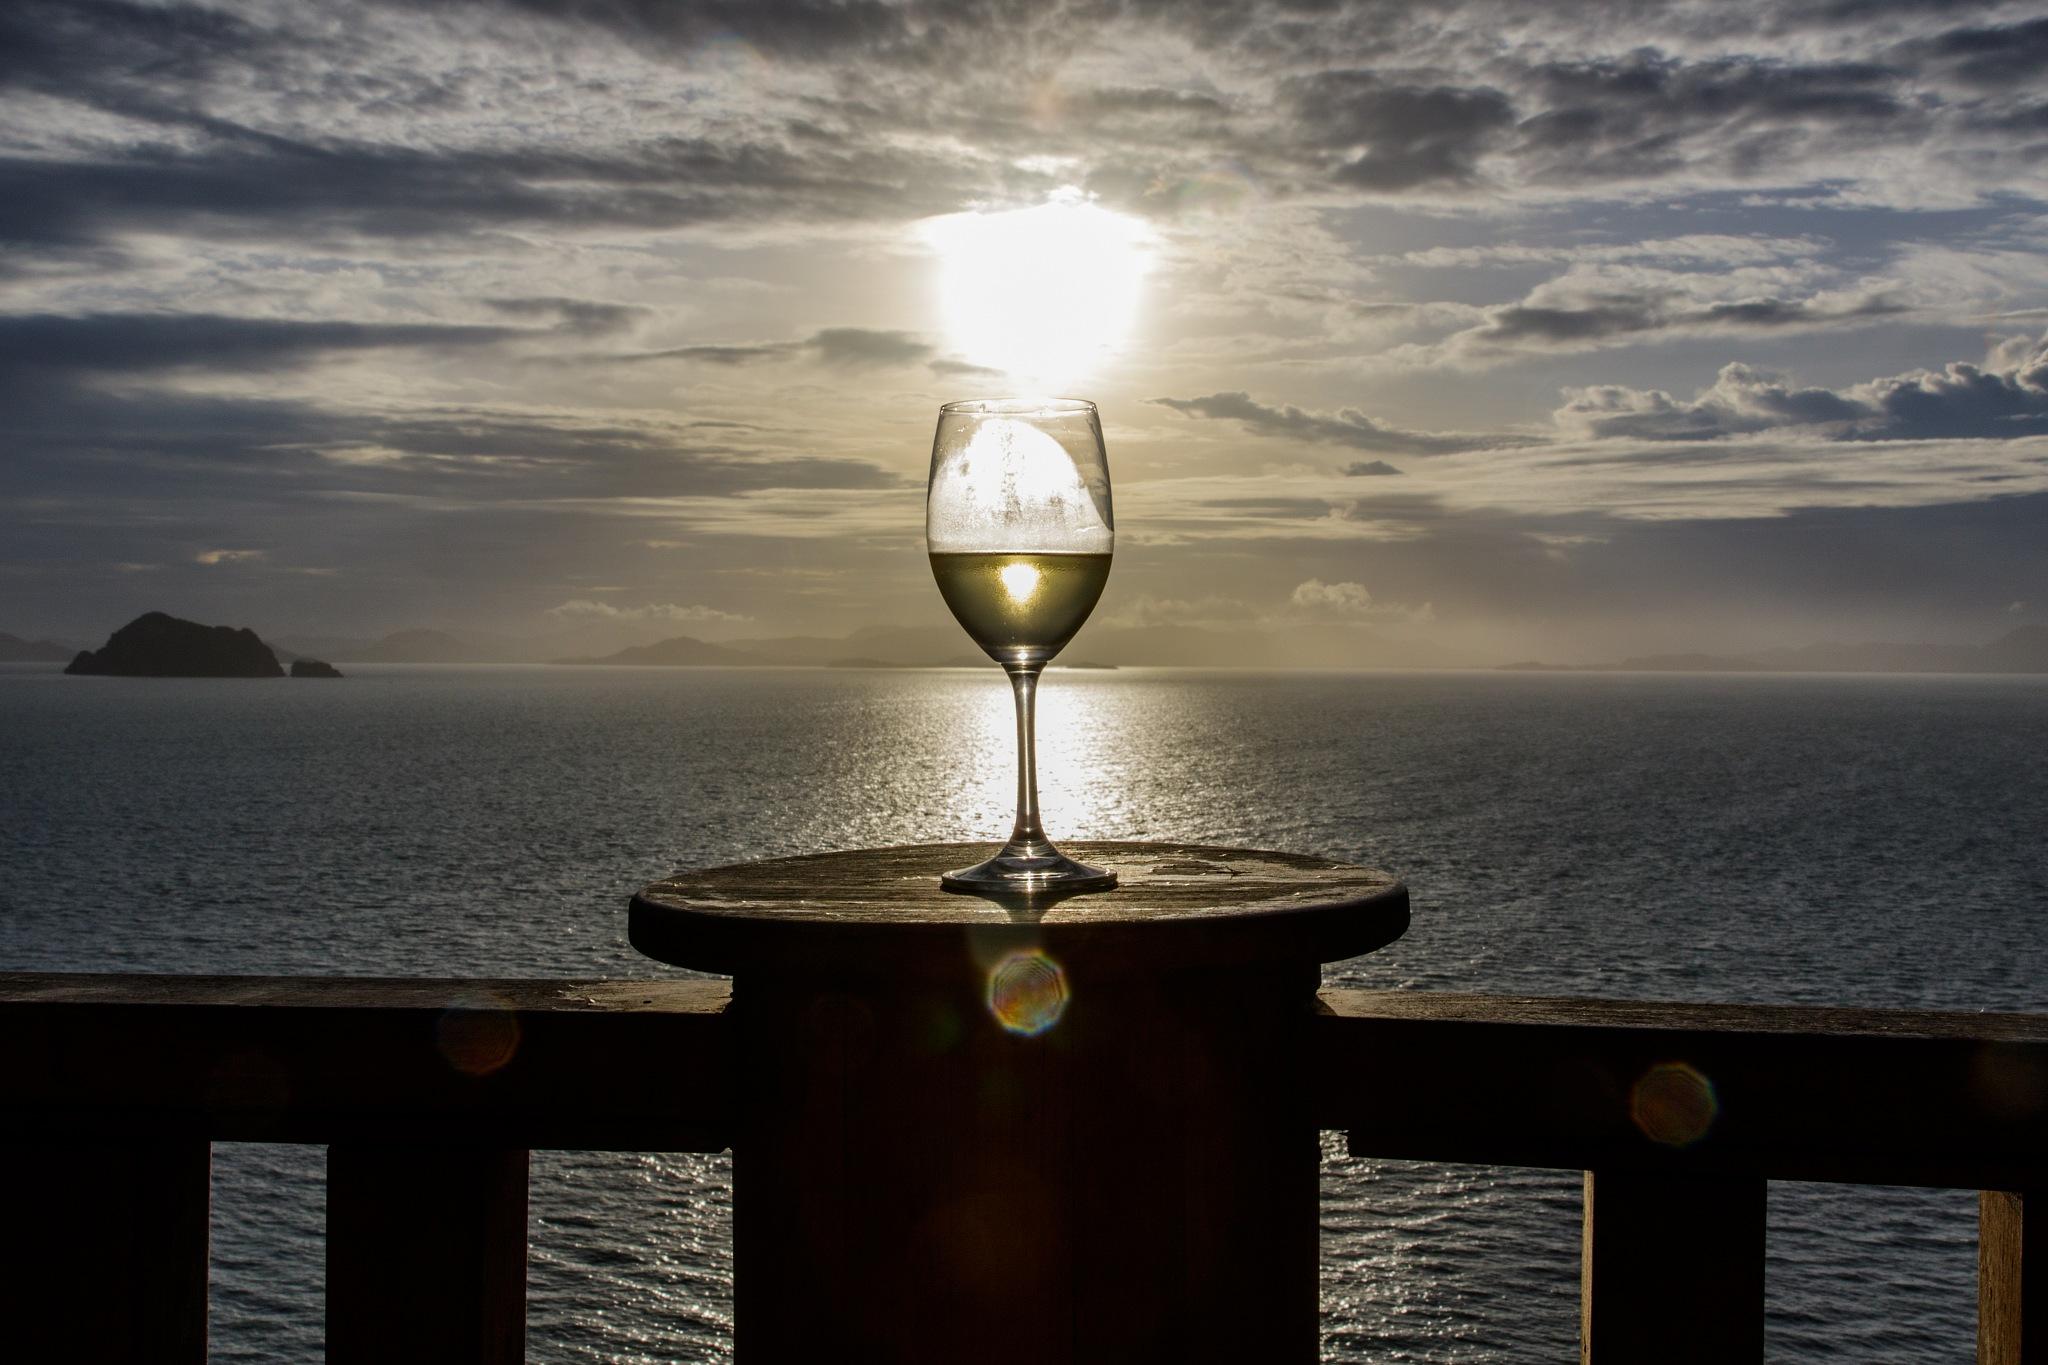 Golden wine on fire in the sunset by Bjarne Gertz Pedersen